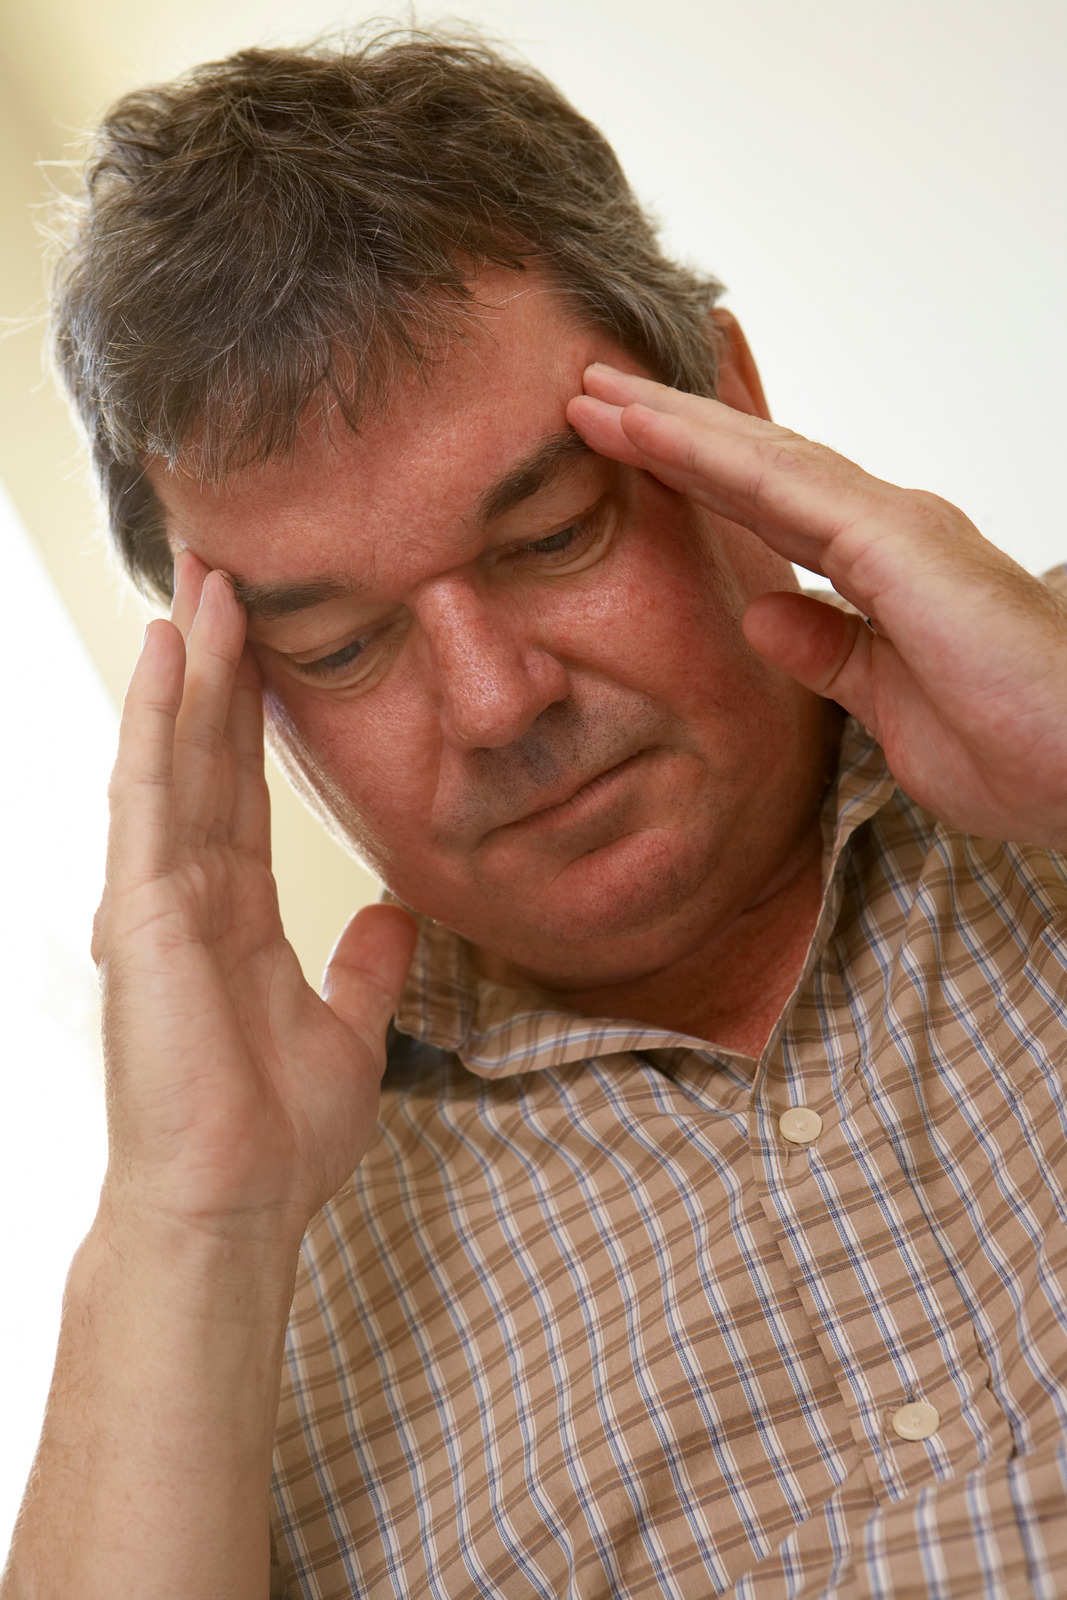 Oil Sheen Headache